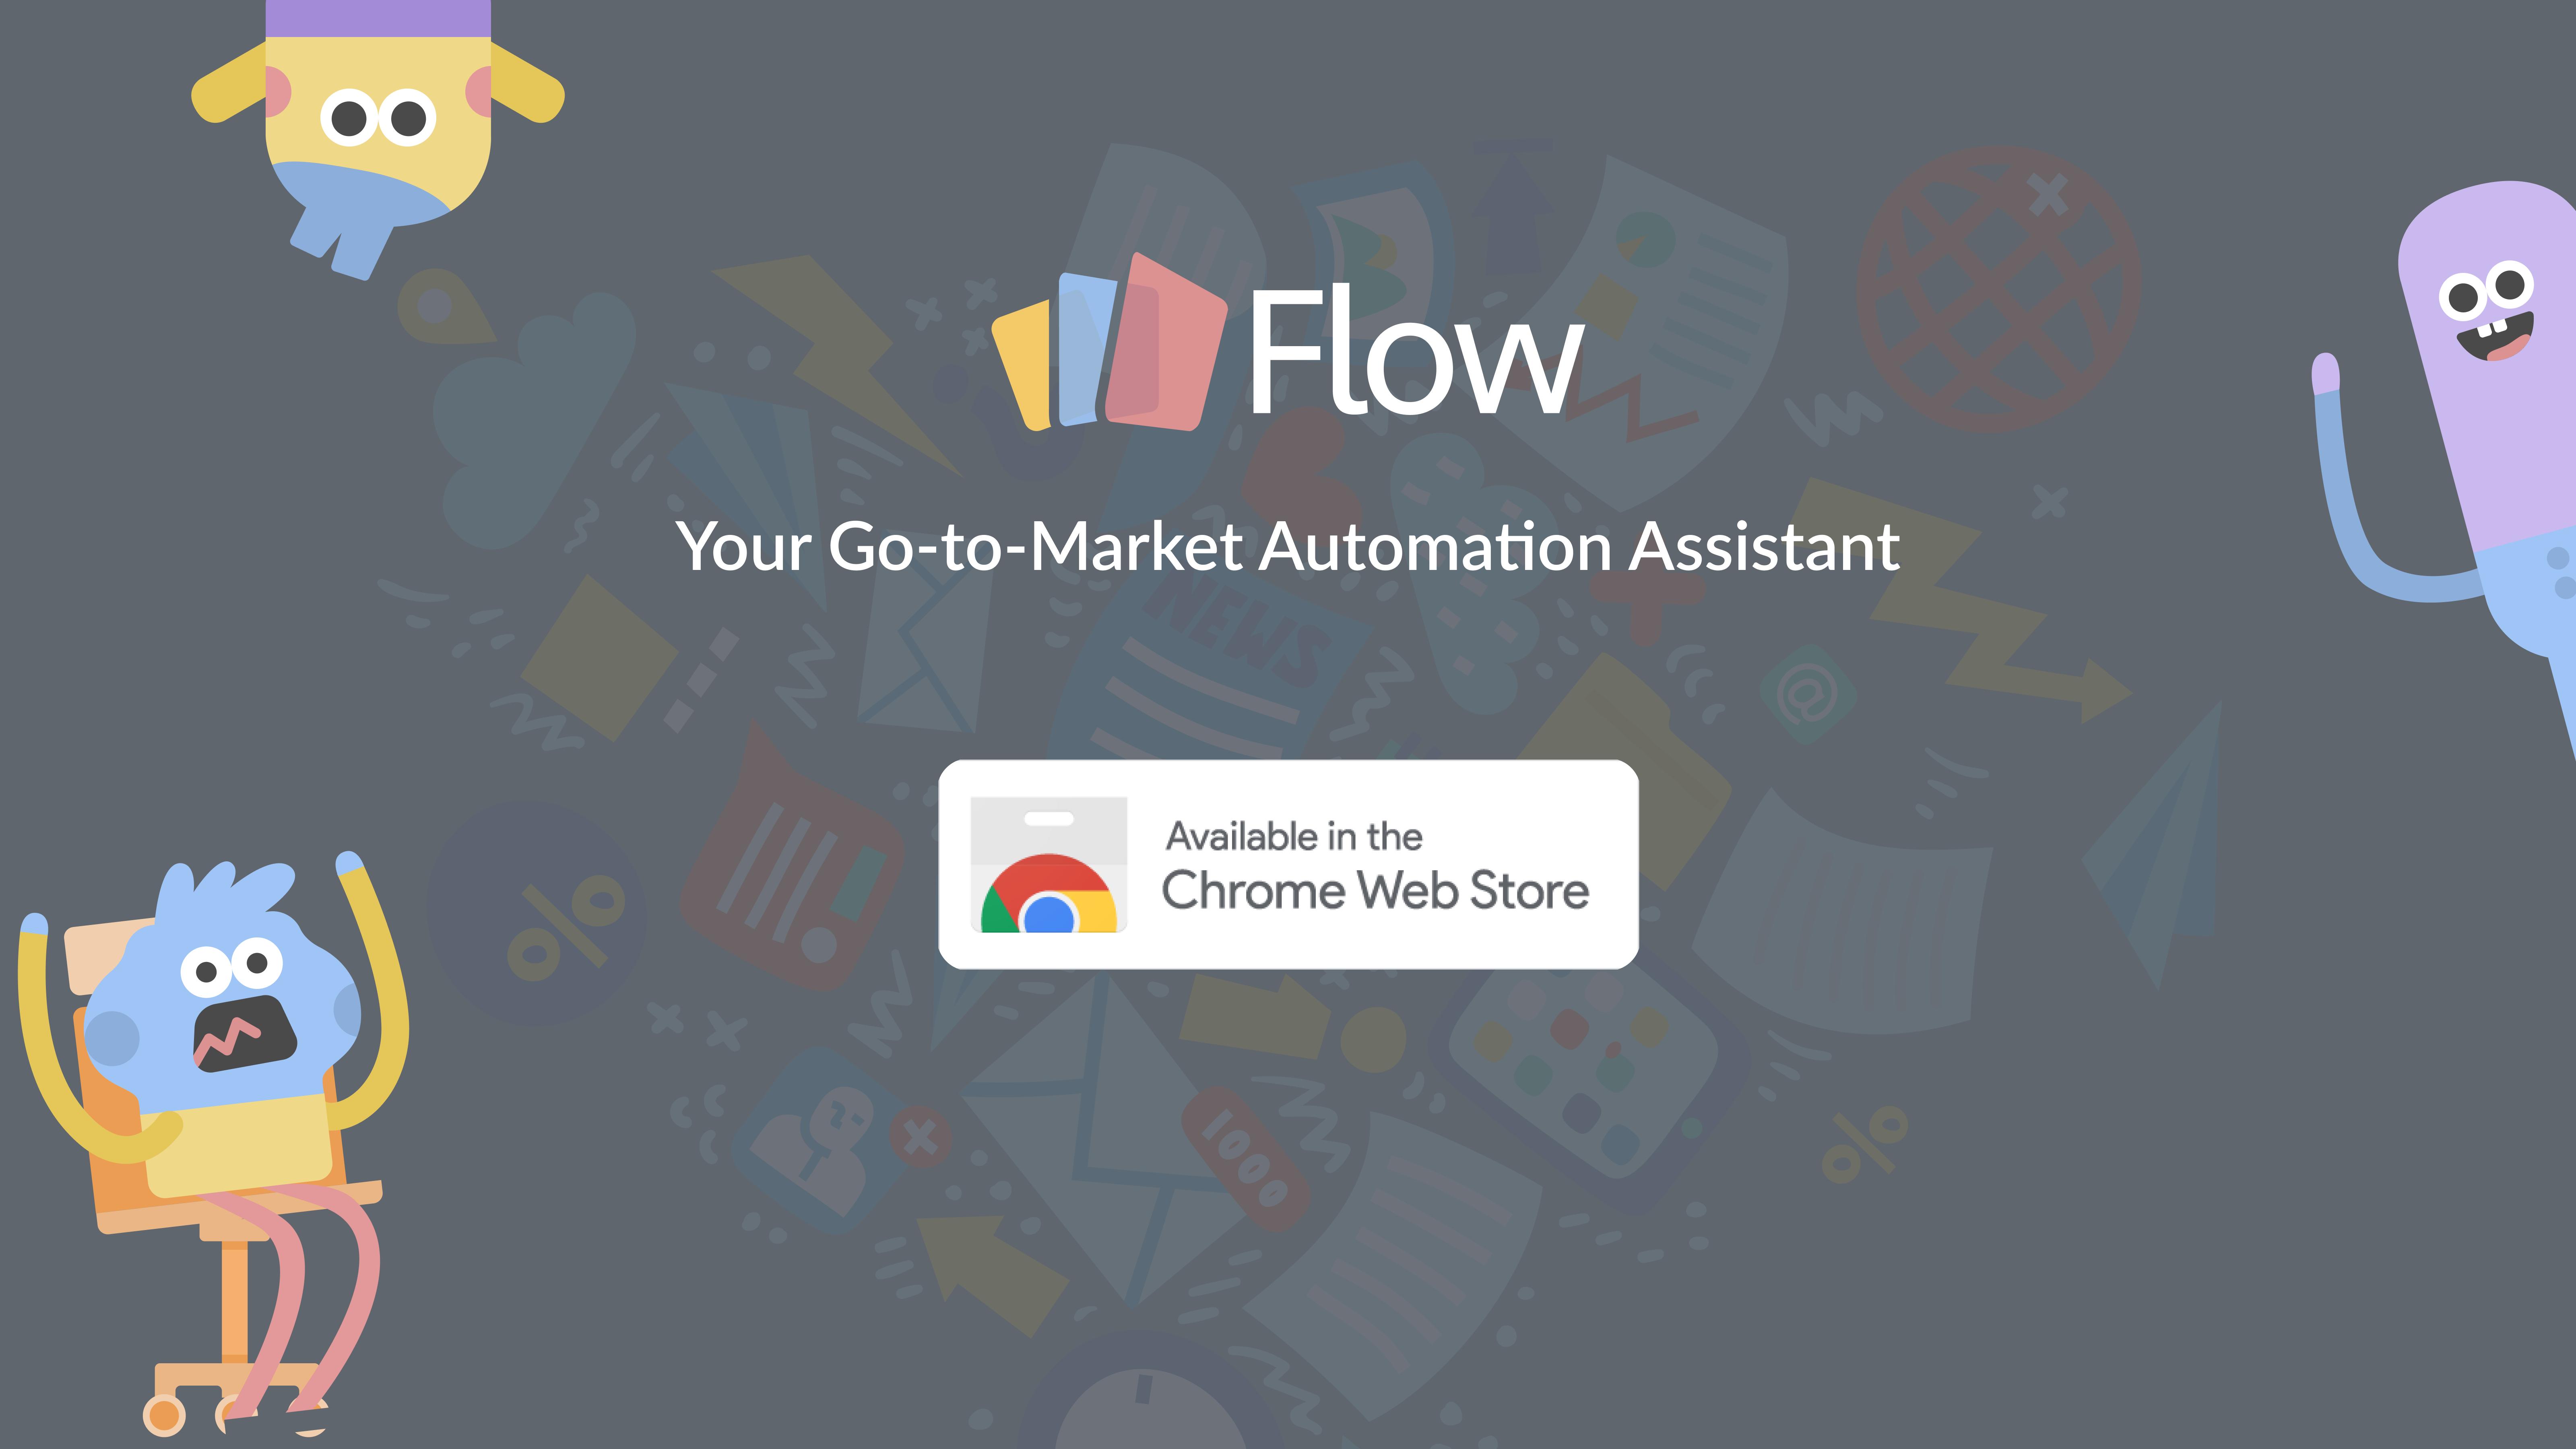 Flow by LeadGenius | Your Go-to-Market Automation Assistant